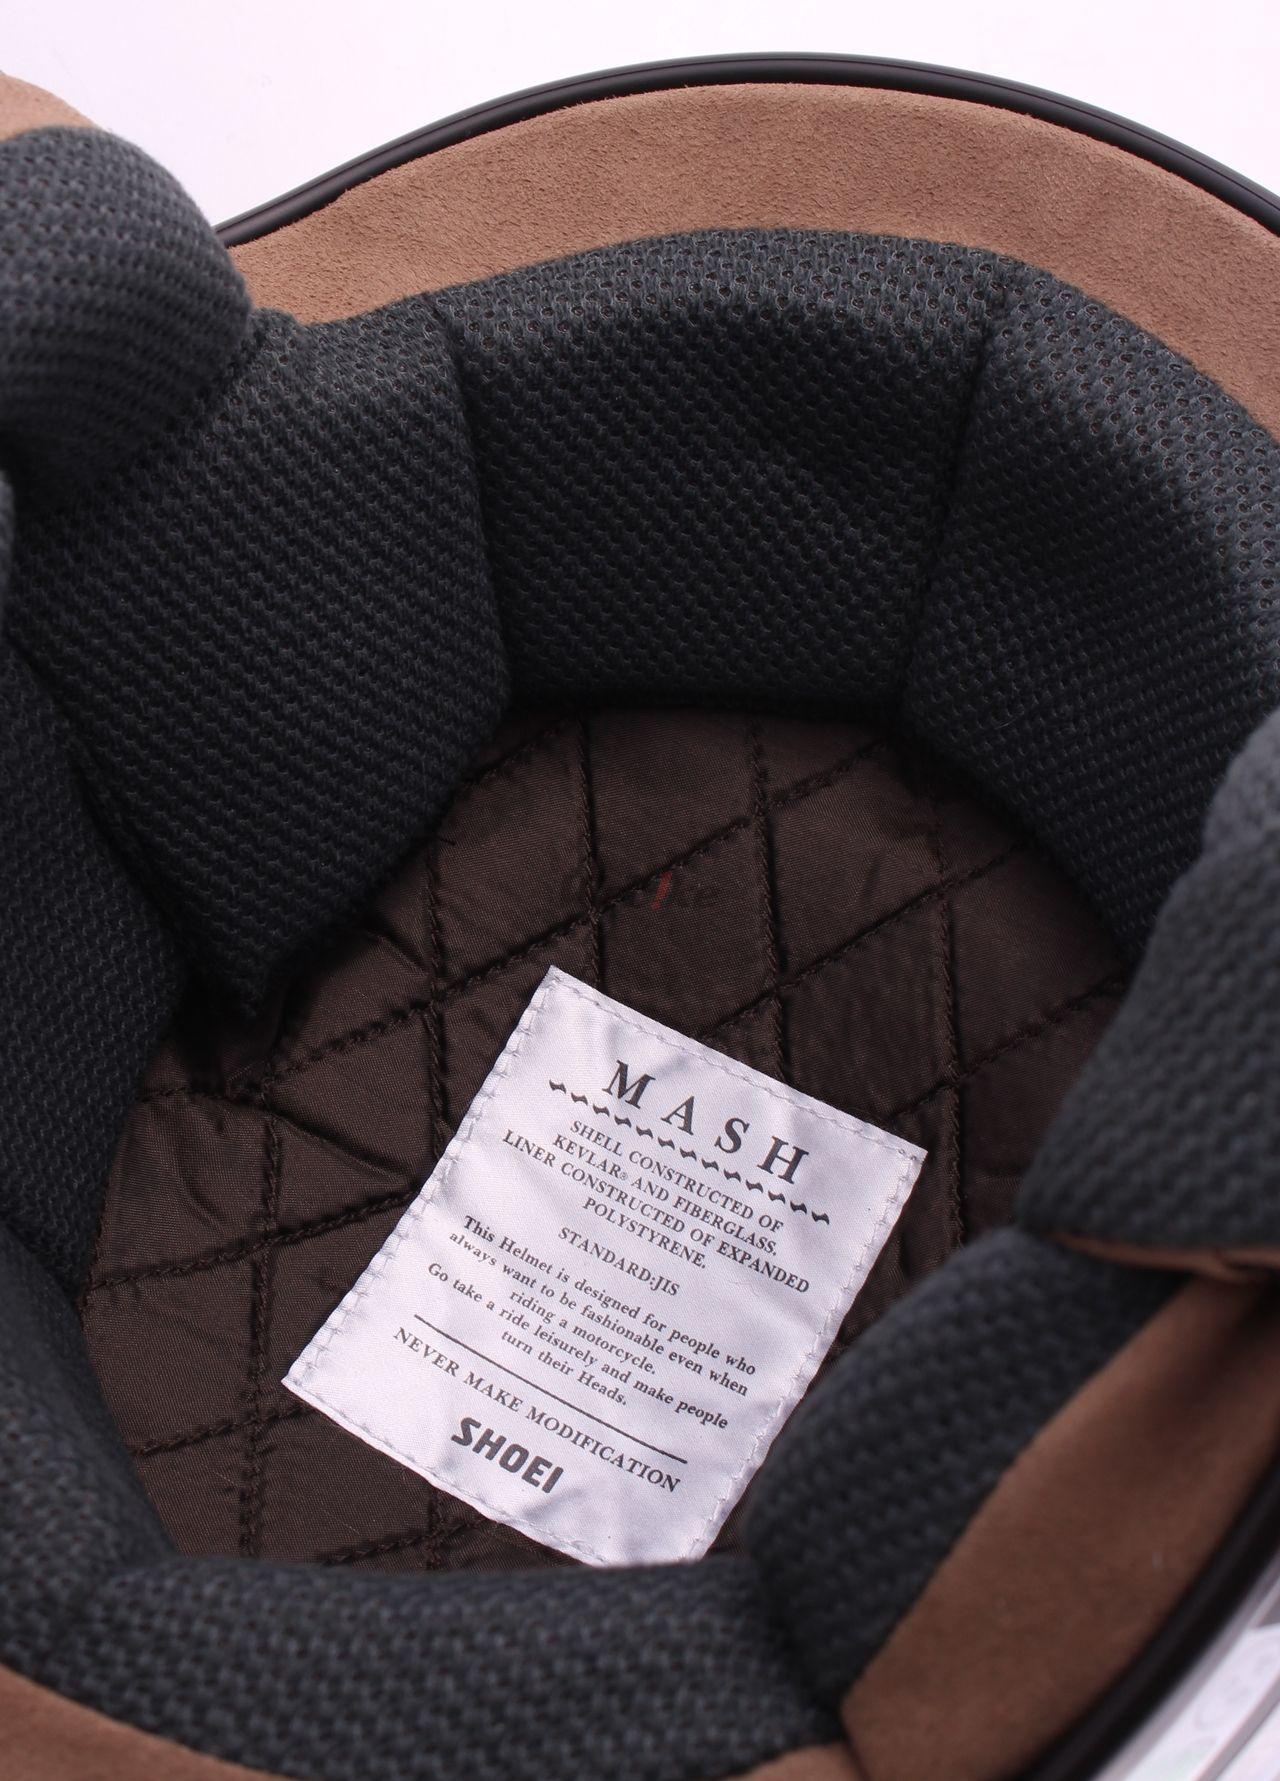 【SHOEI】MASH-X 安全帽 - 「Webike-摩托百貨」